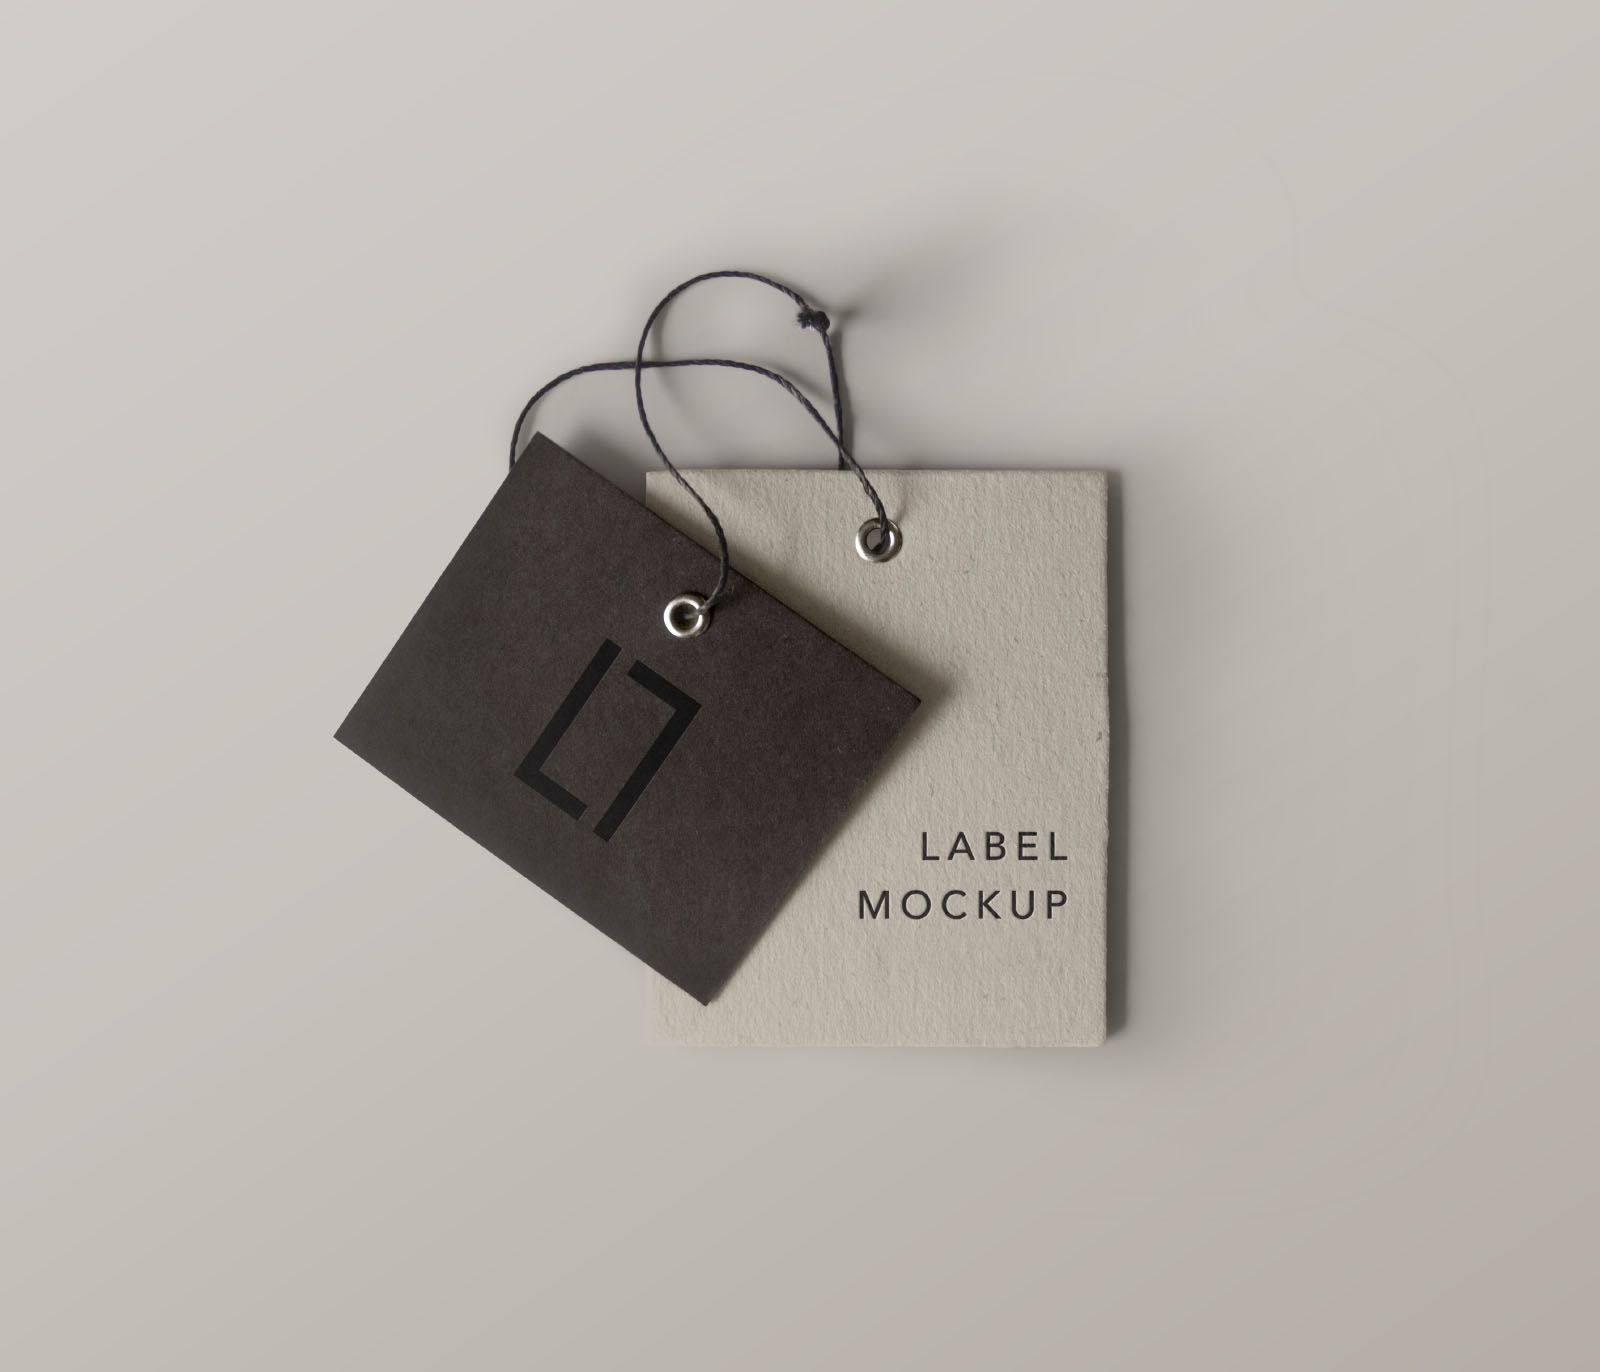 Double Brand Label Mockup